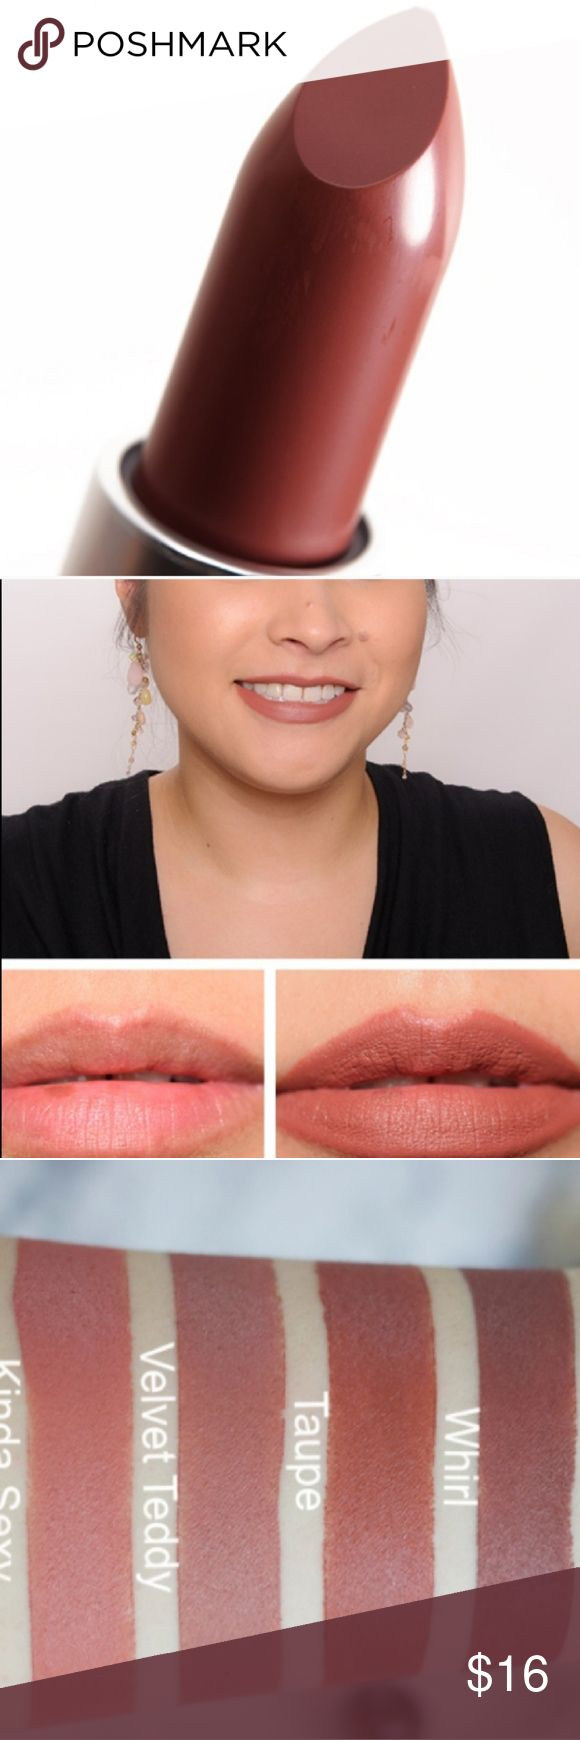 x1 MAC WHIRL MATTE LIPSTICK BRAND NEW BOXED x1 MAC WHIRL MATTE LIPSTICK BRAND NEW BOXED. MAC Cosmetics Makeup Lipstick